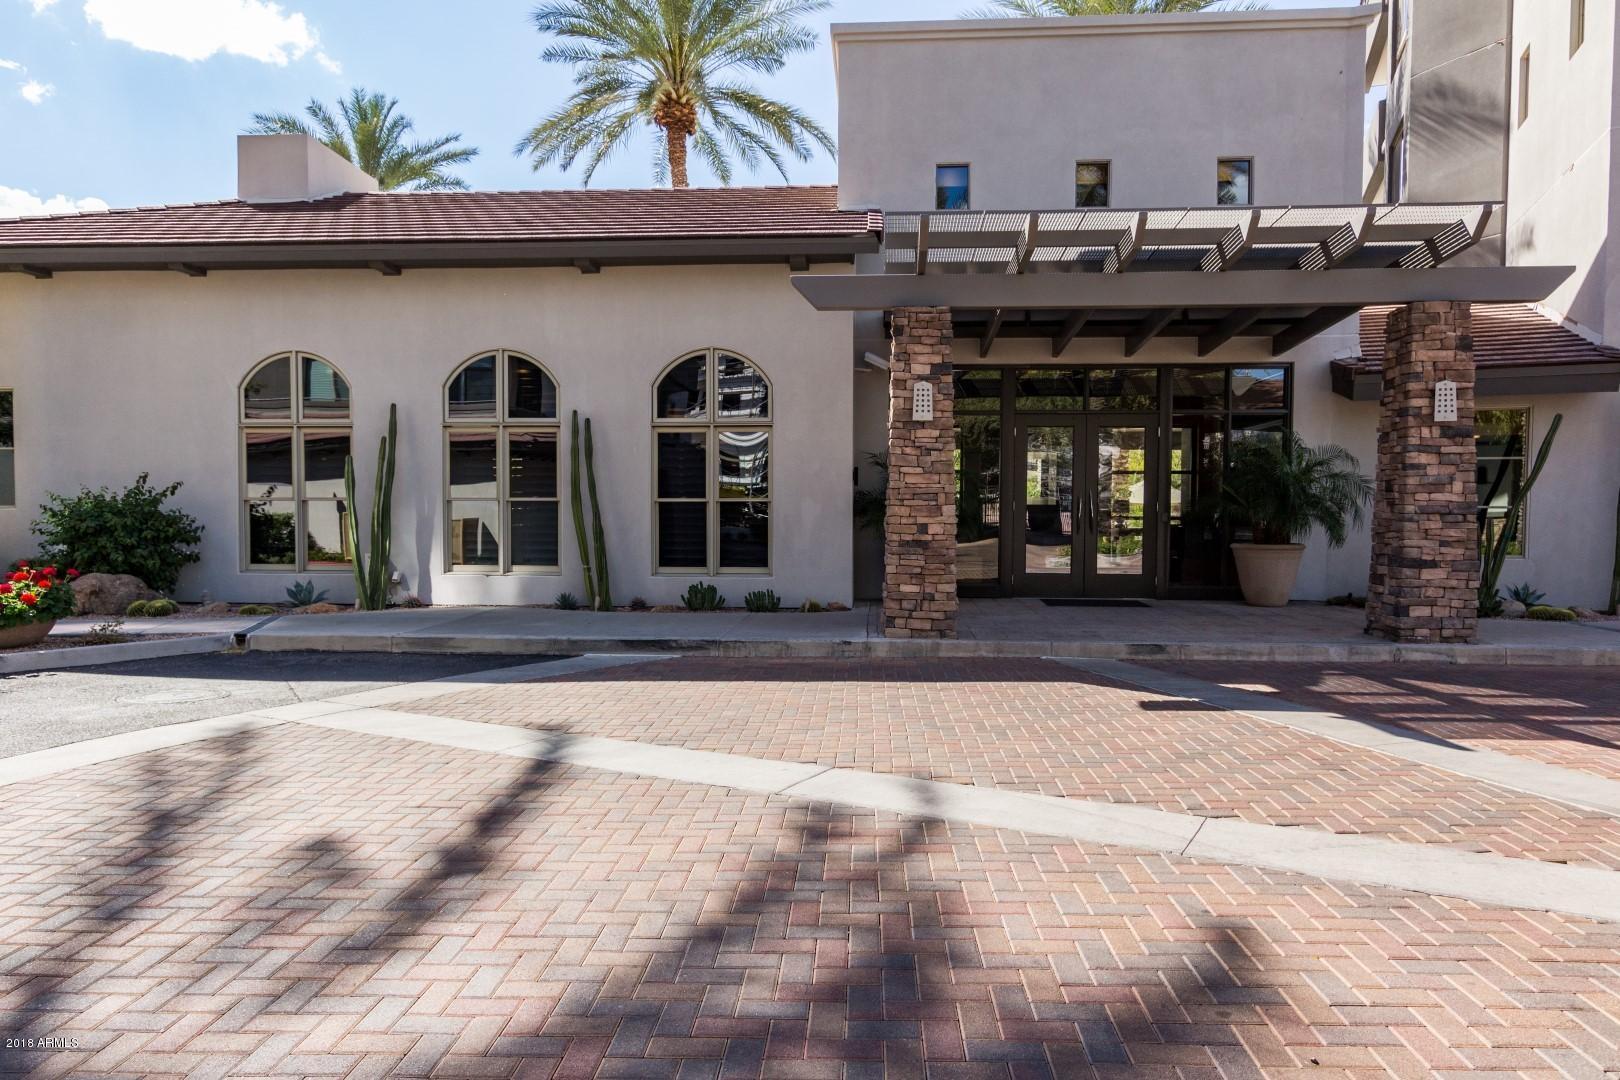 MLS 5831354 15802 N 71ST Street Unit 651 Building II, Scottsdale, AZ 85254 Scottsdale AZ Scottsdale Airpark Area